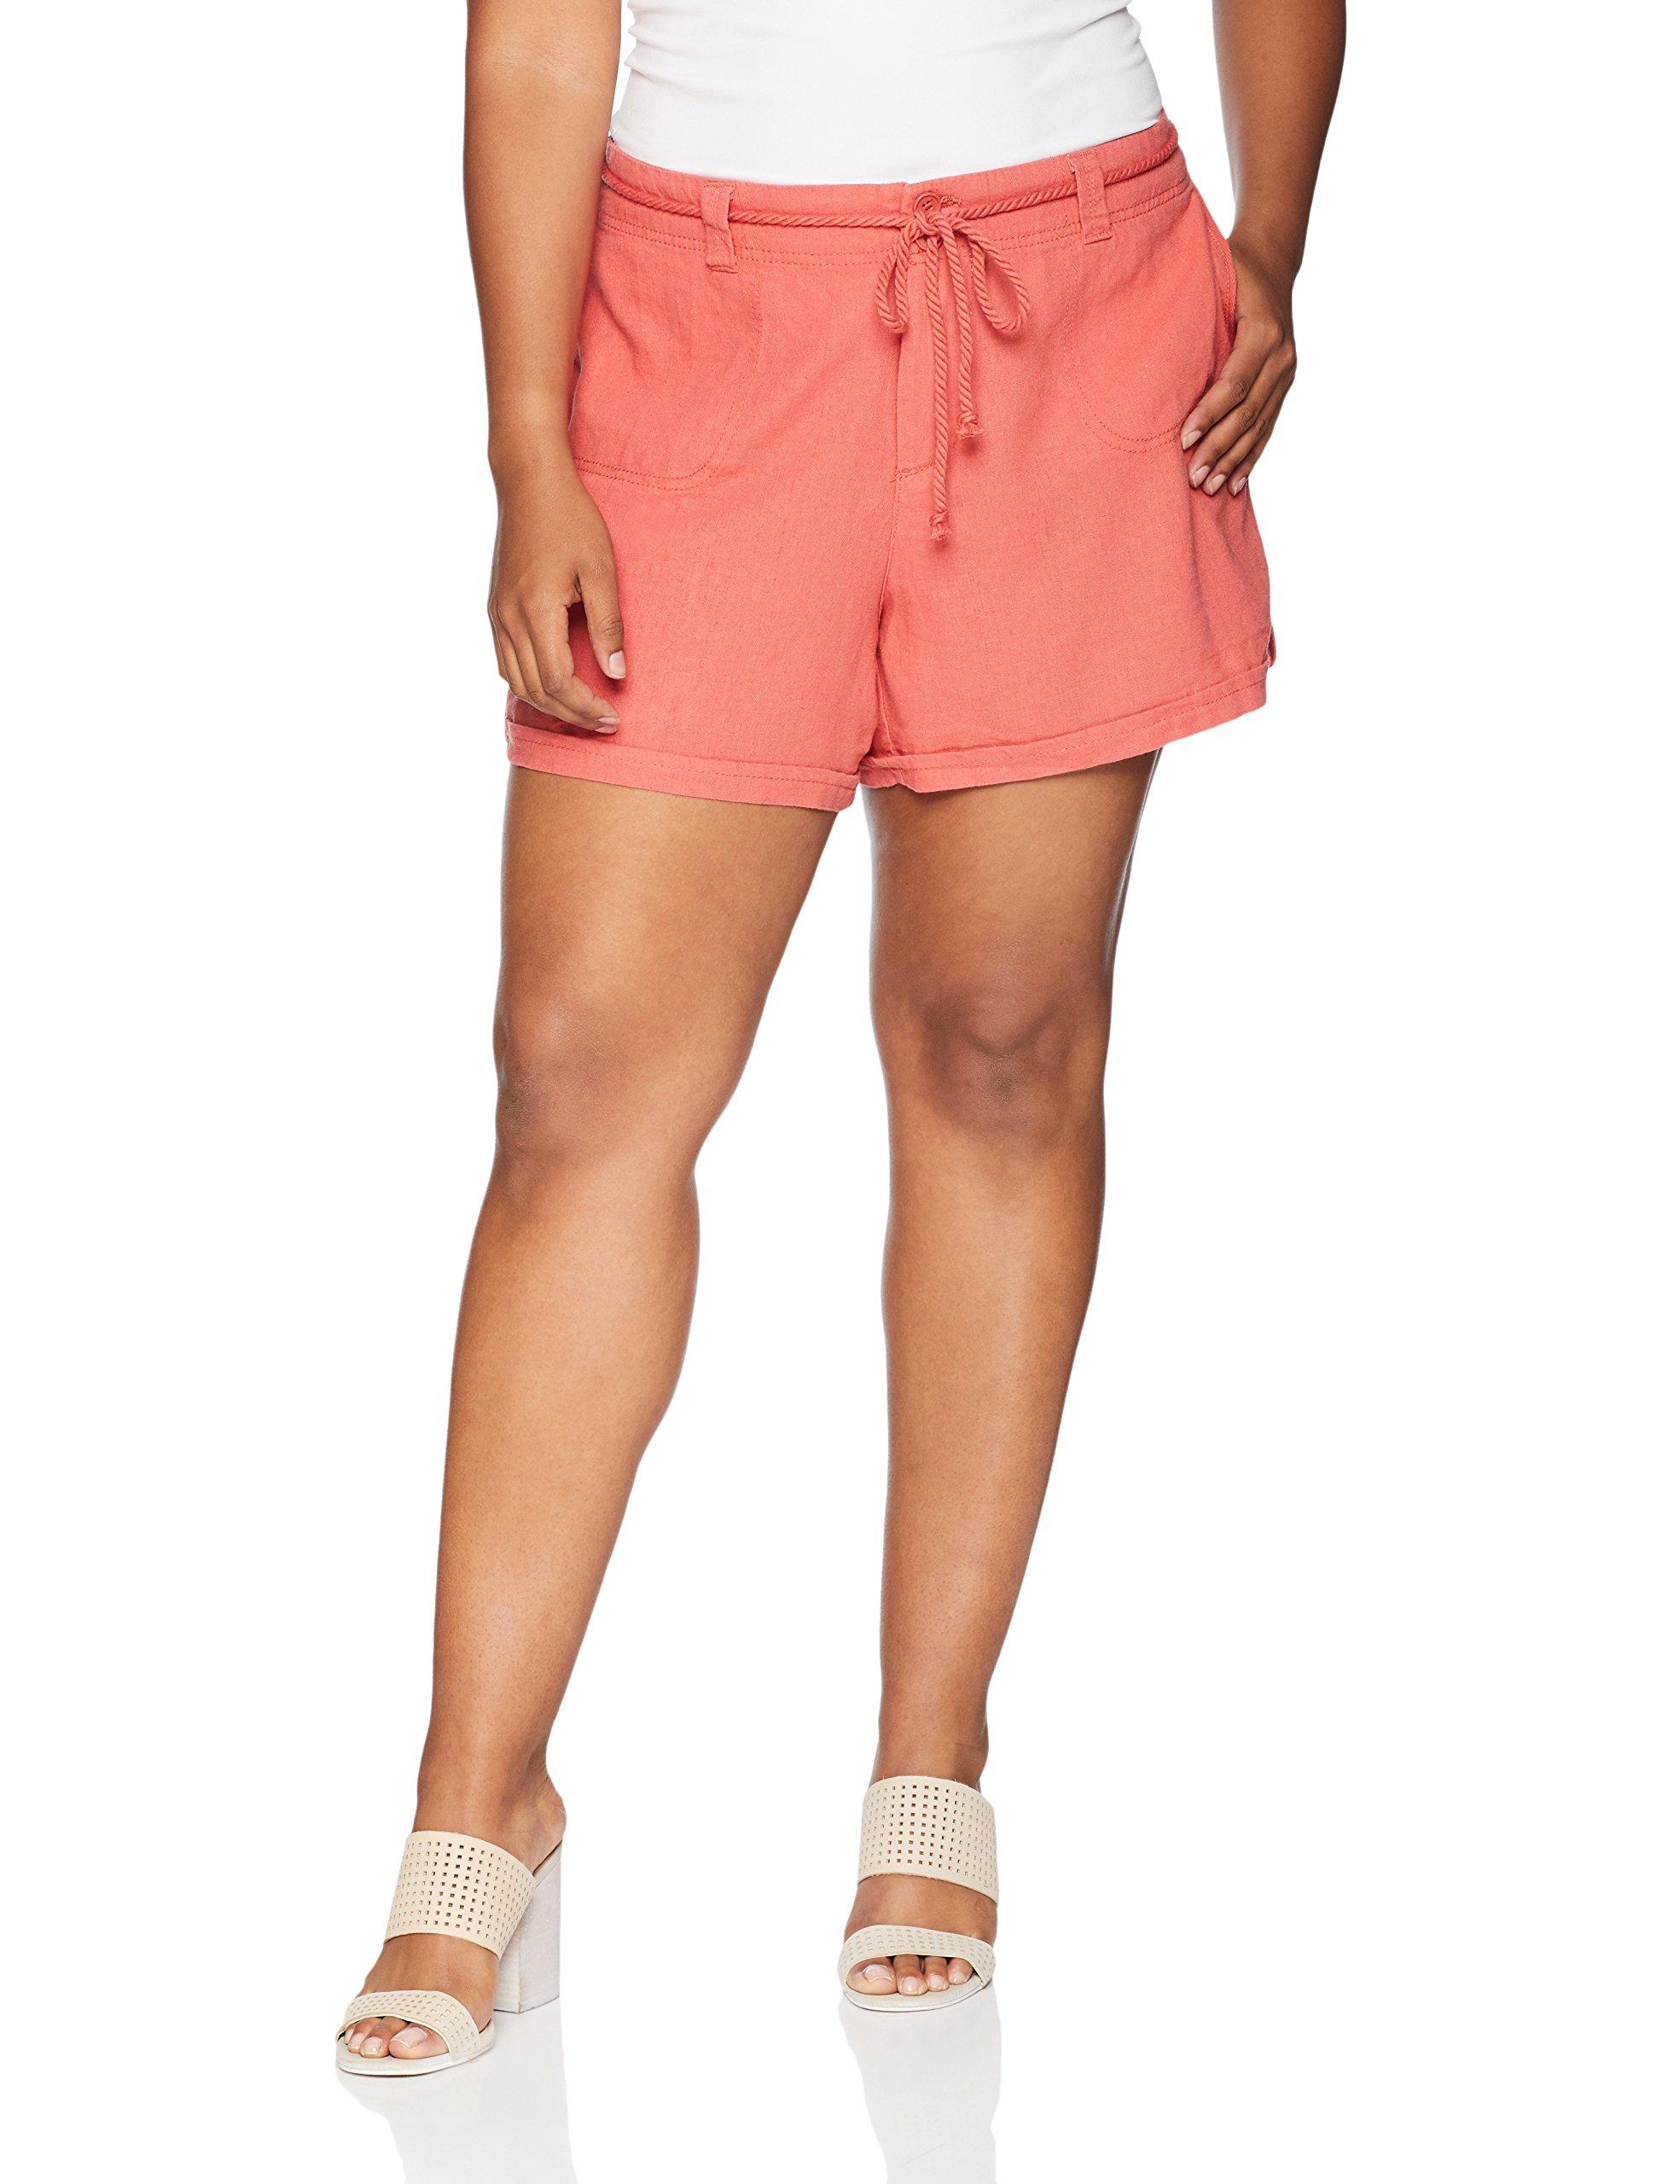 dollhouse Women's Plus Size Linen, Burnt Sienna, 14